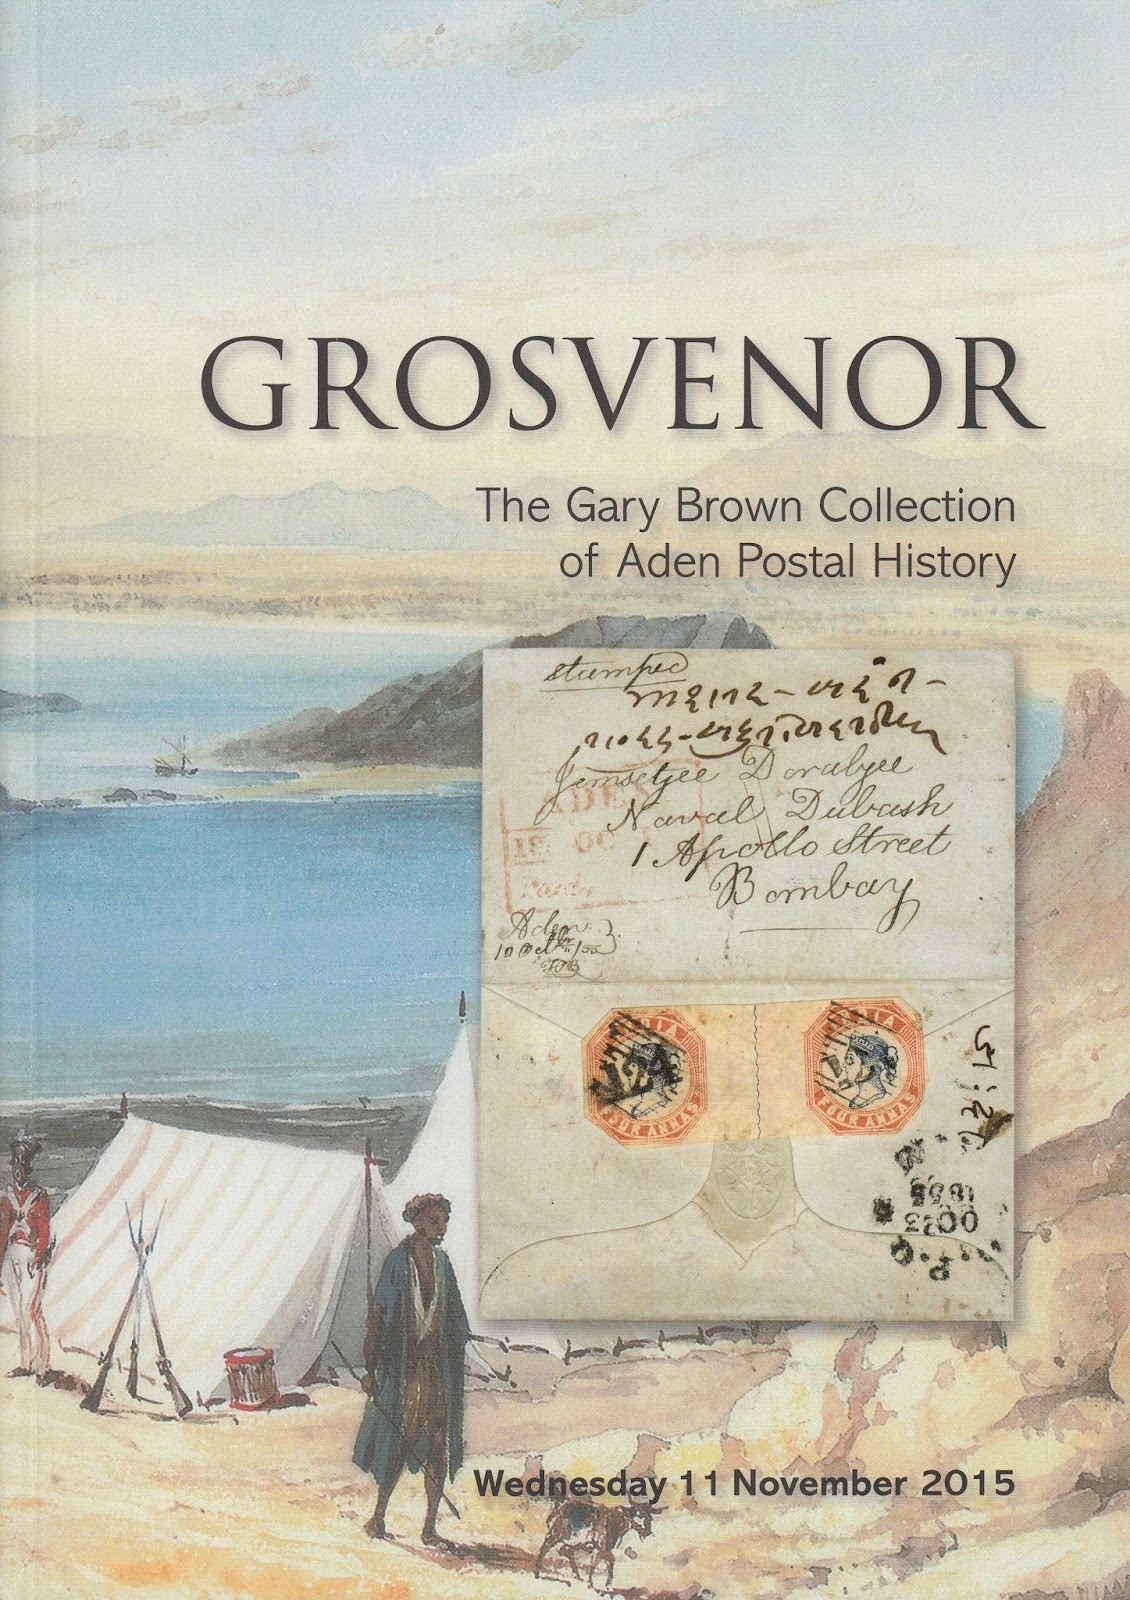 The Gary Brown Collection, Aden Postal History, Grosvenor